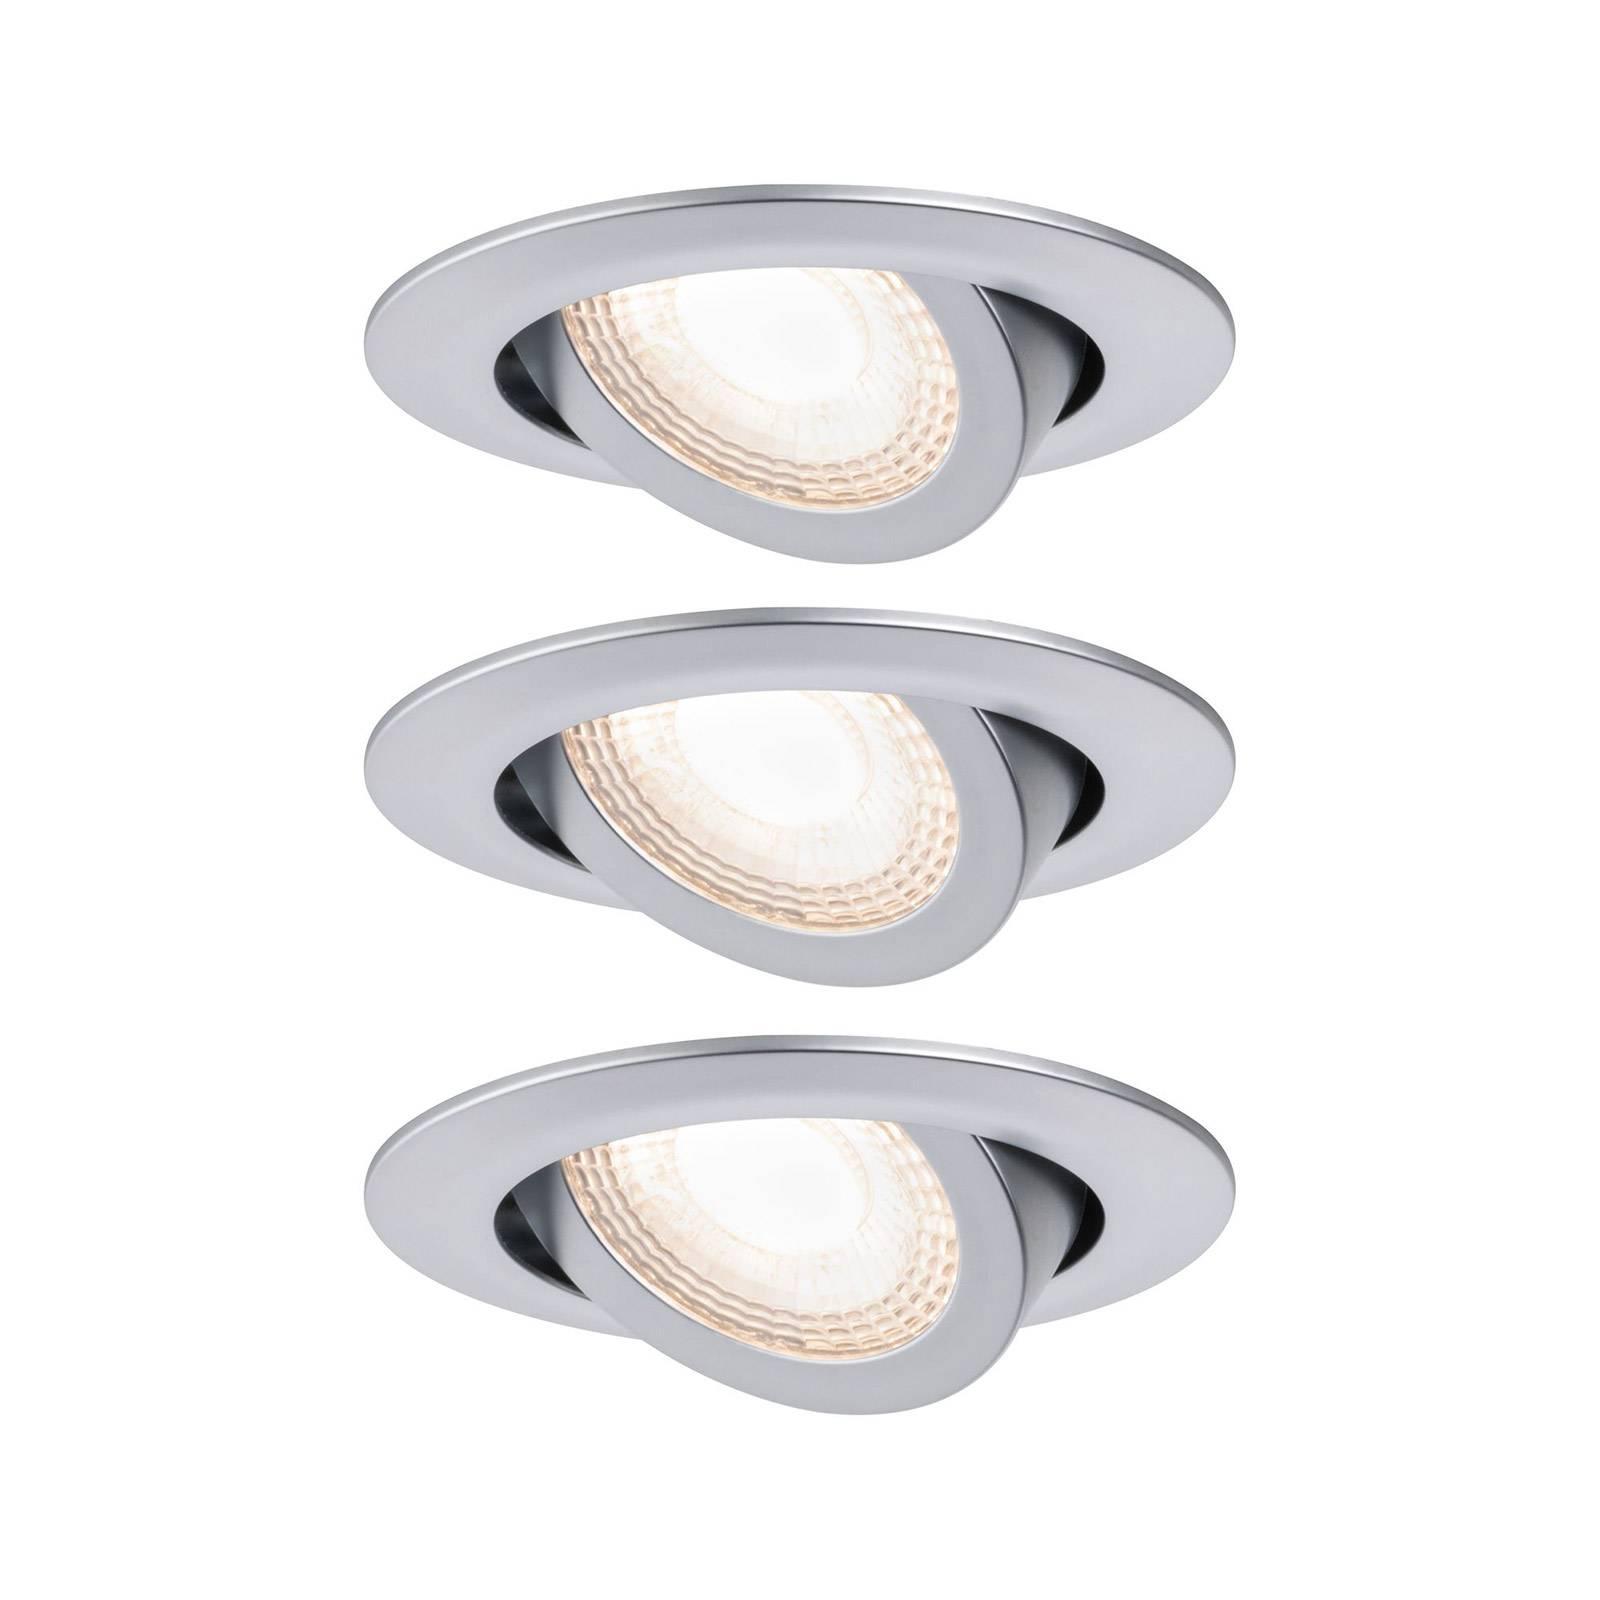 Paulmann-LED-uppovalo 93389, 3 x 6 W:n sarja